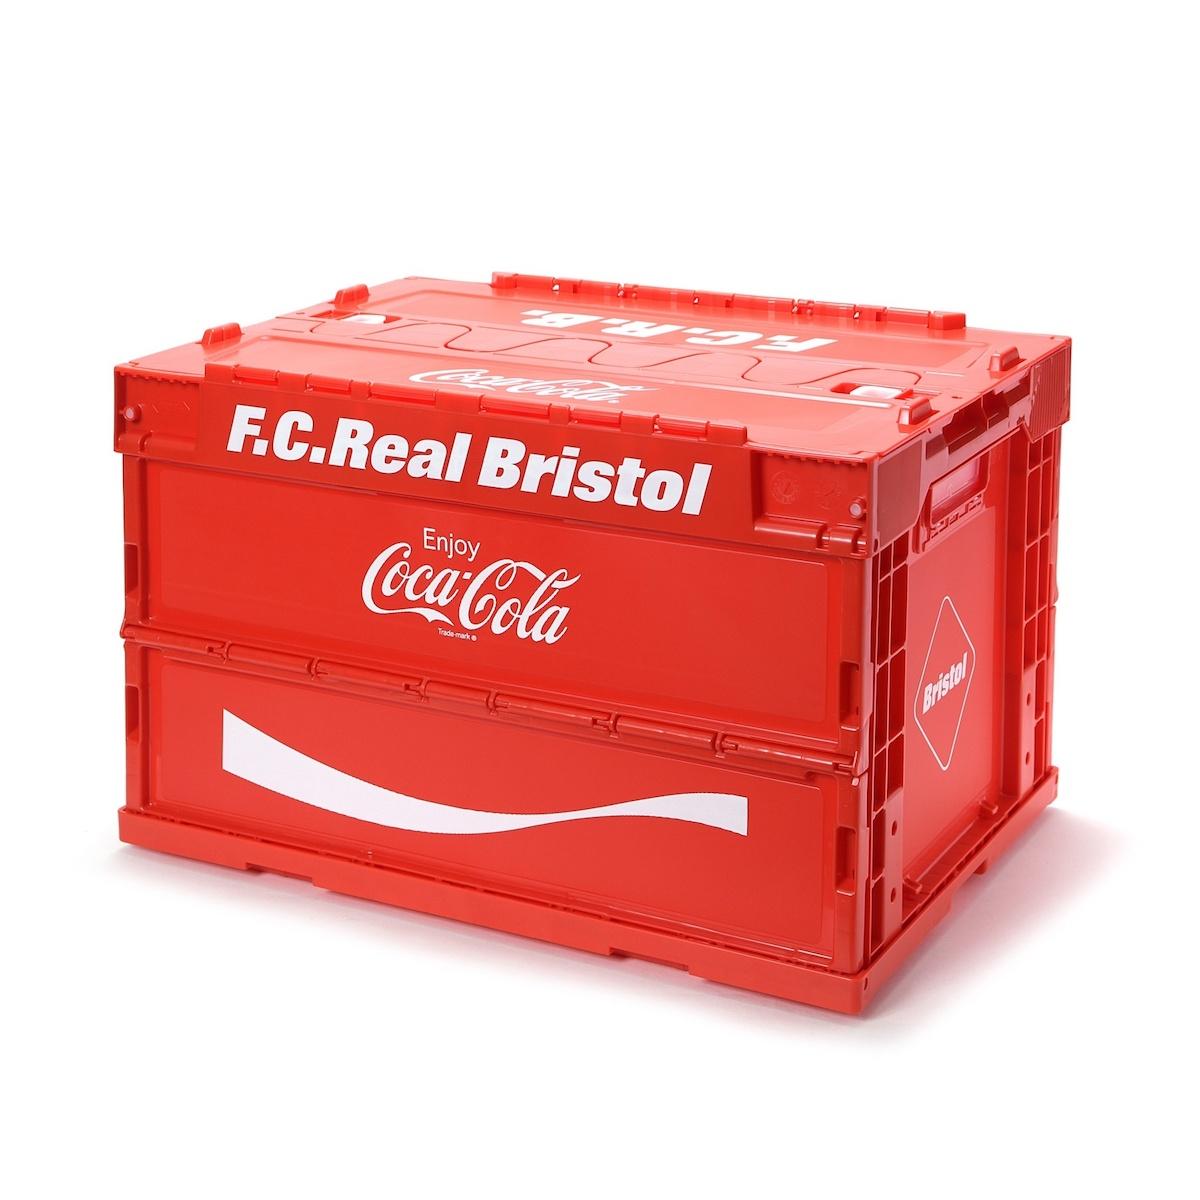 F.C.Real Bristol / COCA-COLA FOLDABLE CONTAINER (Red)